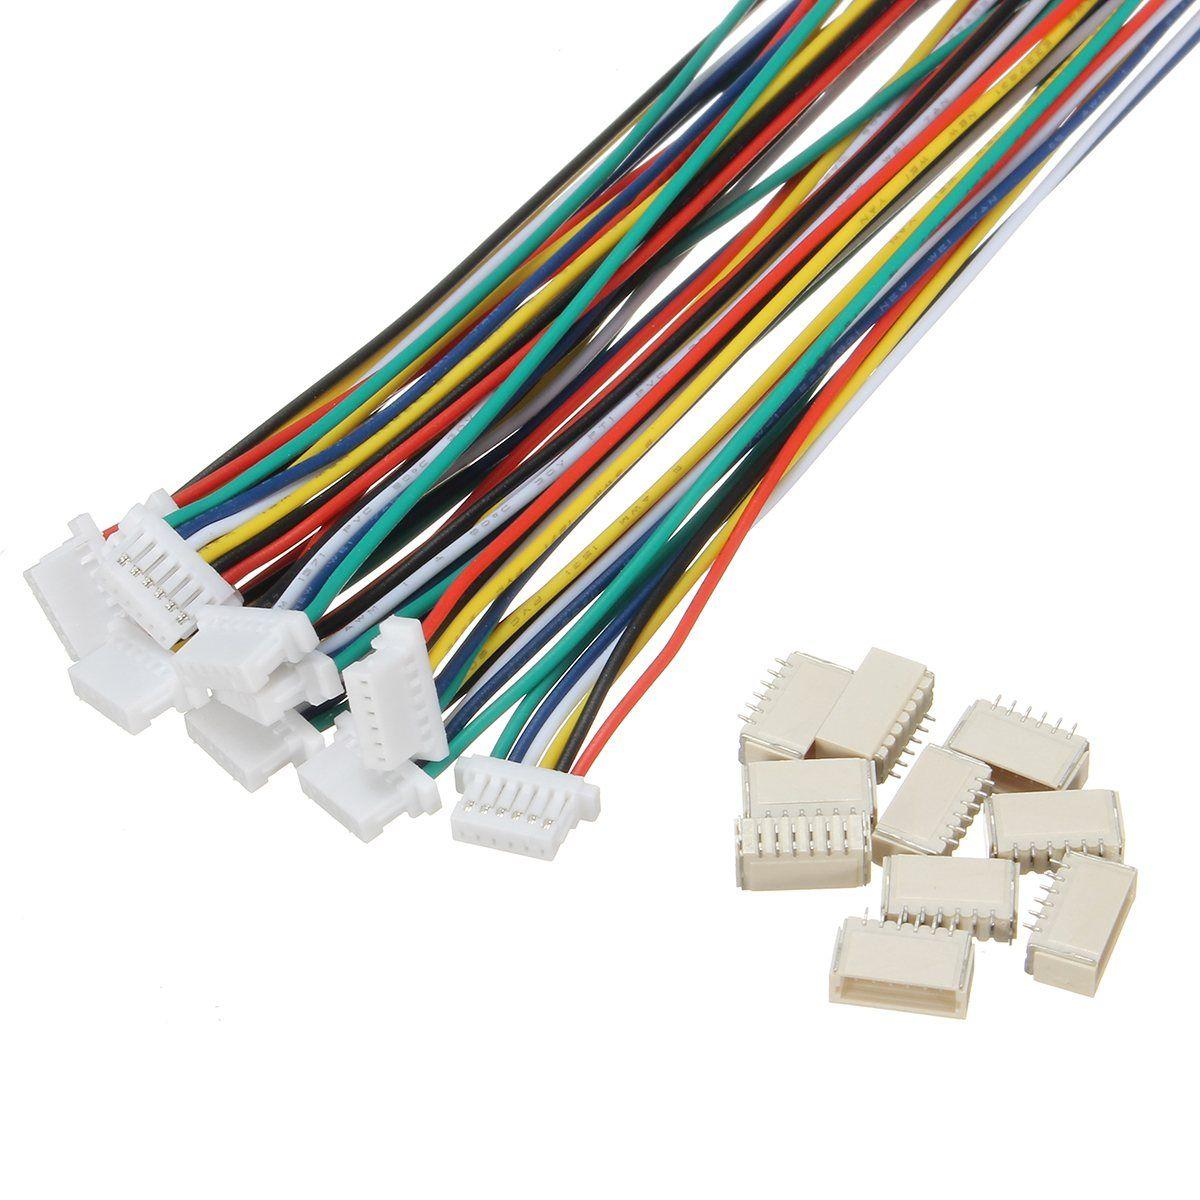 Wholesale price 10 Sets Mini Micro 1.0mm SH 6-Pin Connector Plug ...